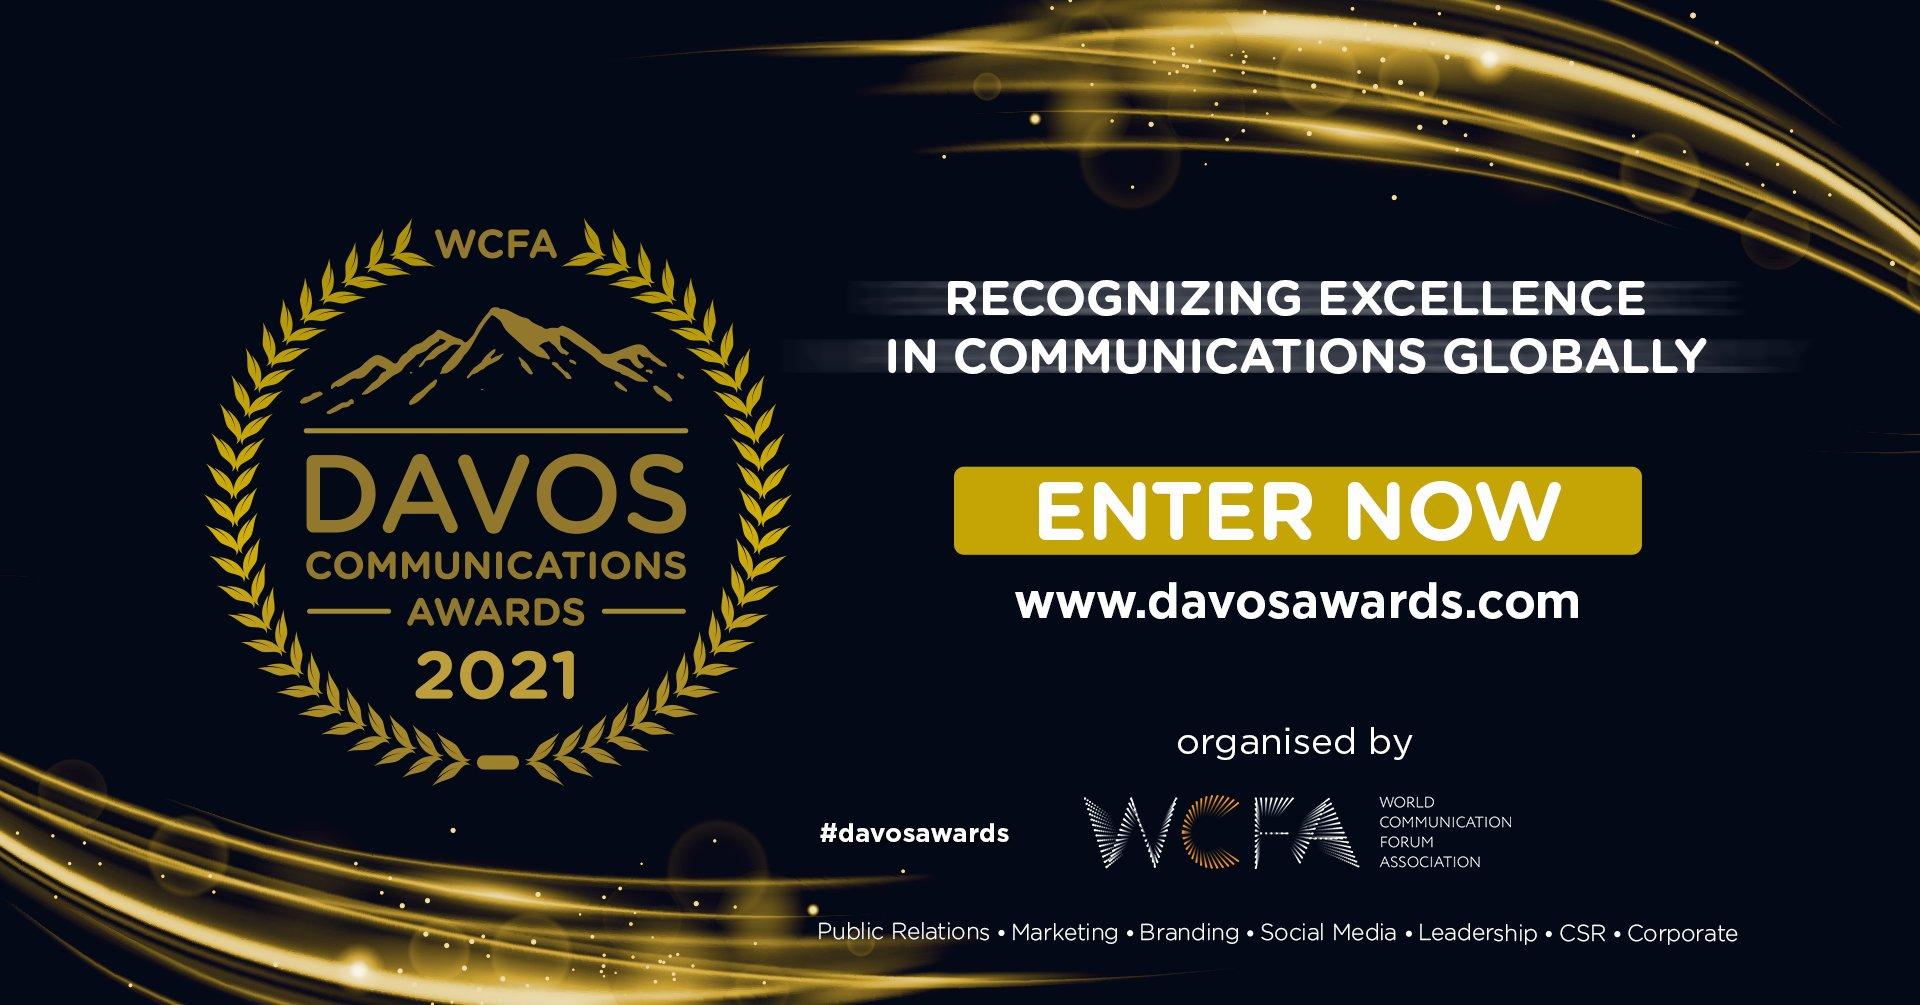 Davos Communications Awards celebrate excellent global PR